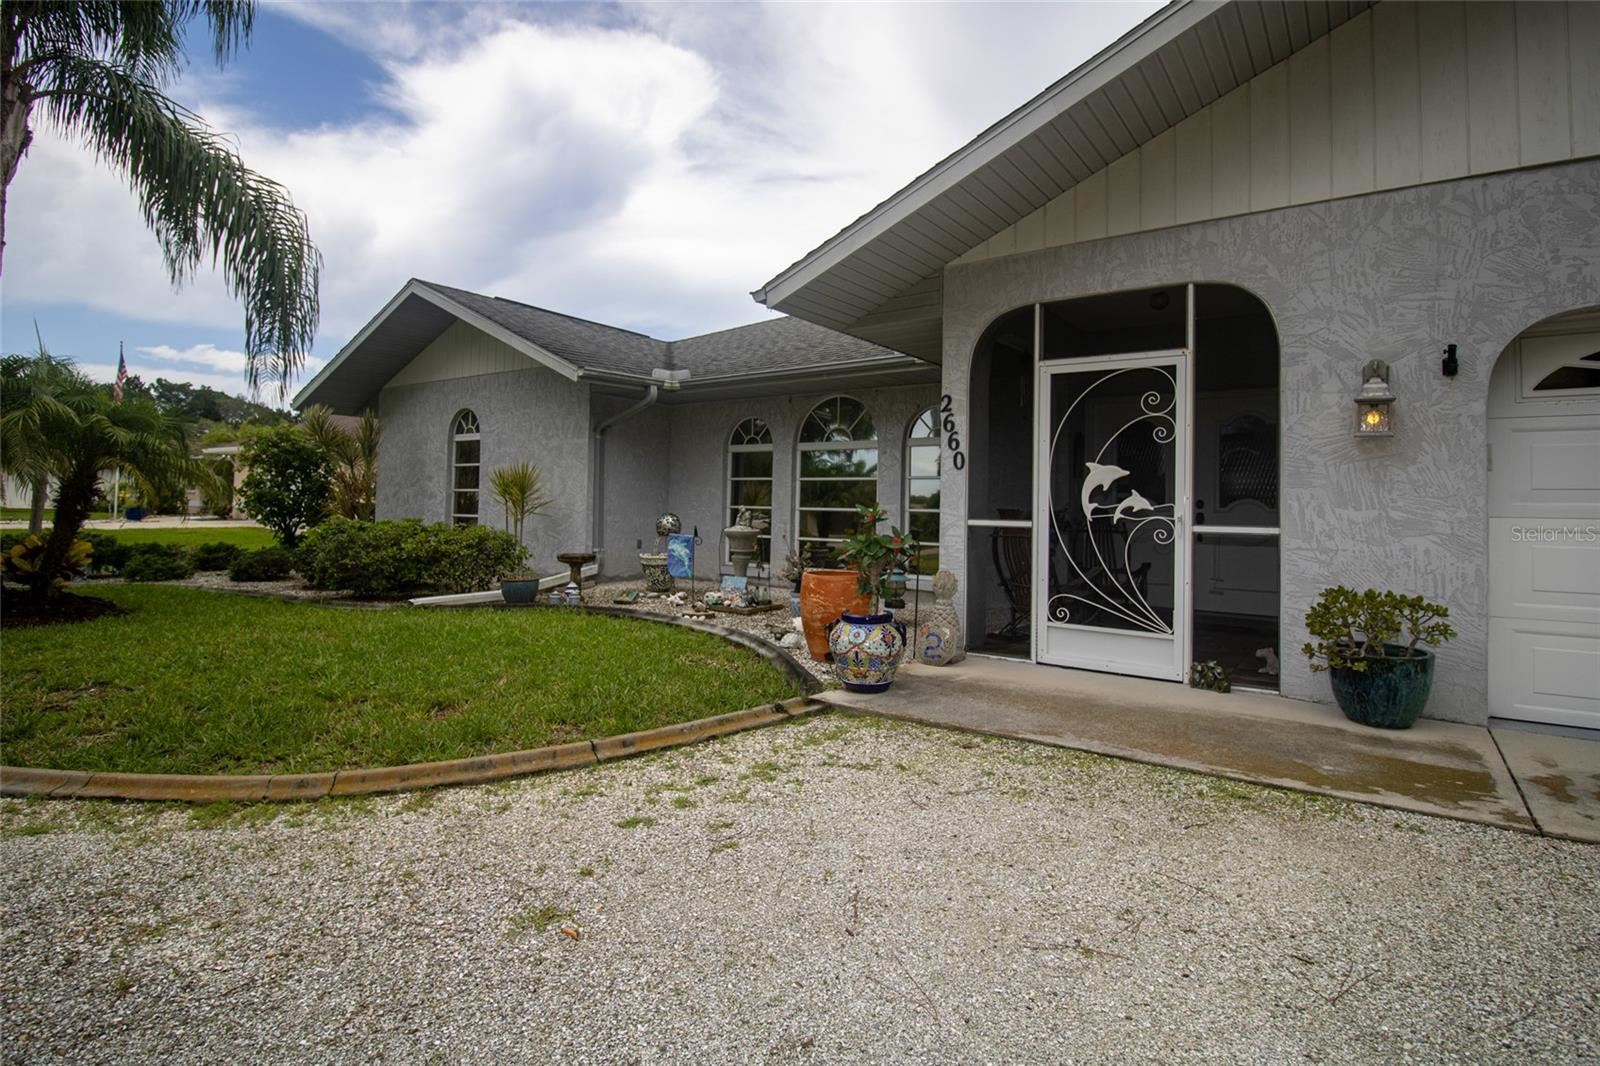 Photo of 2660 ALAMANDER AVENUE, ENGLEWOOD, FL 34223 (MLS # D6120250)